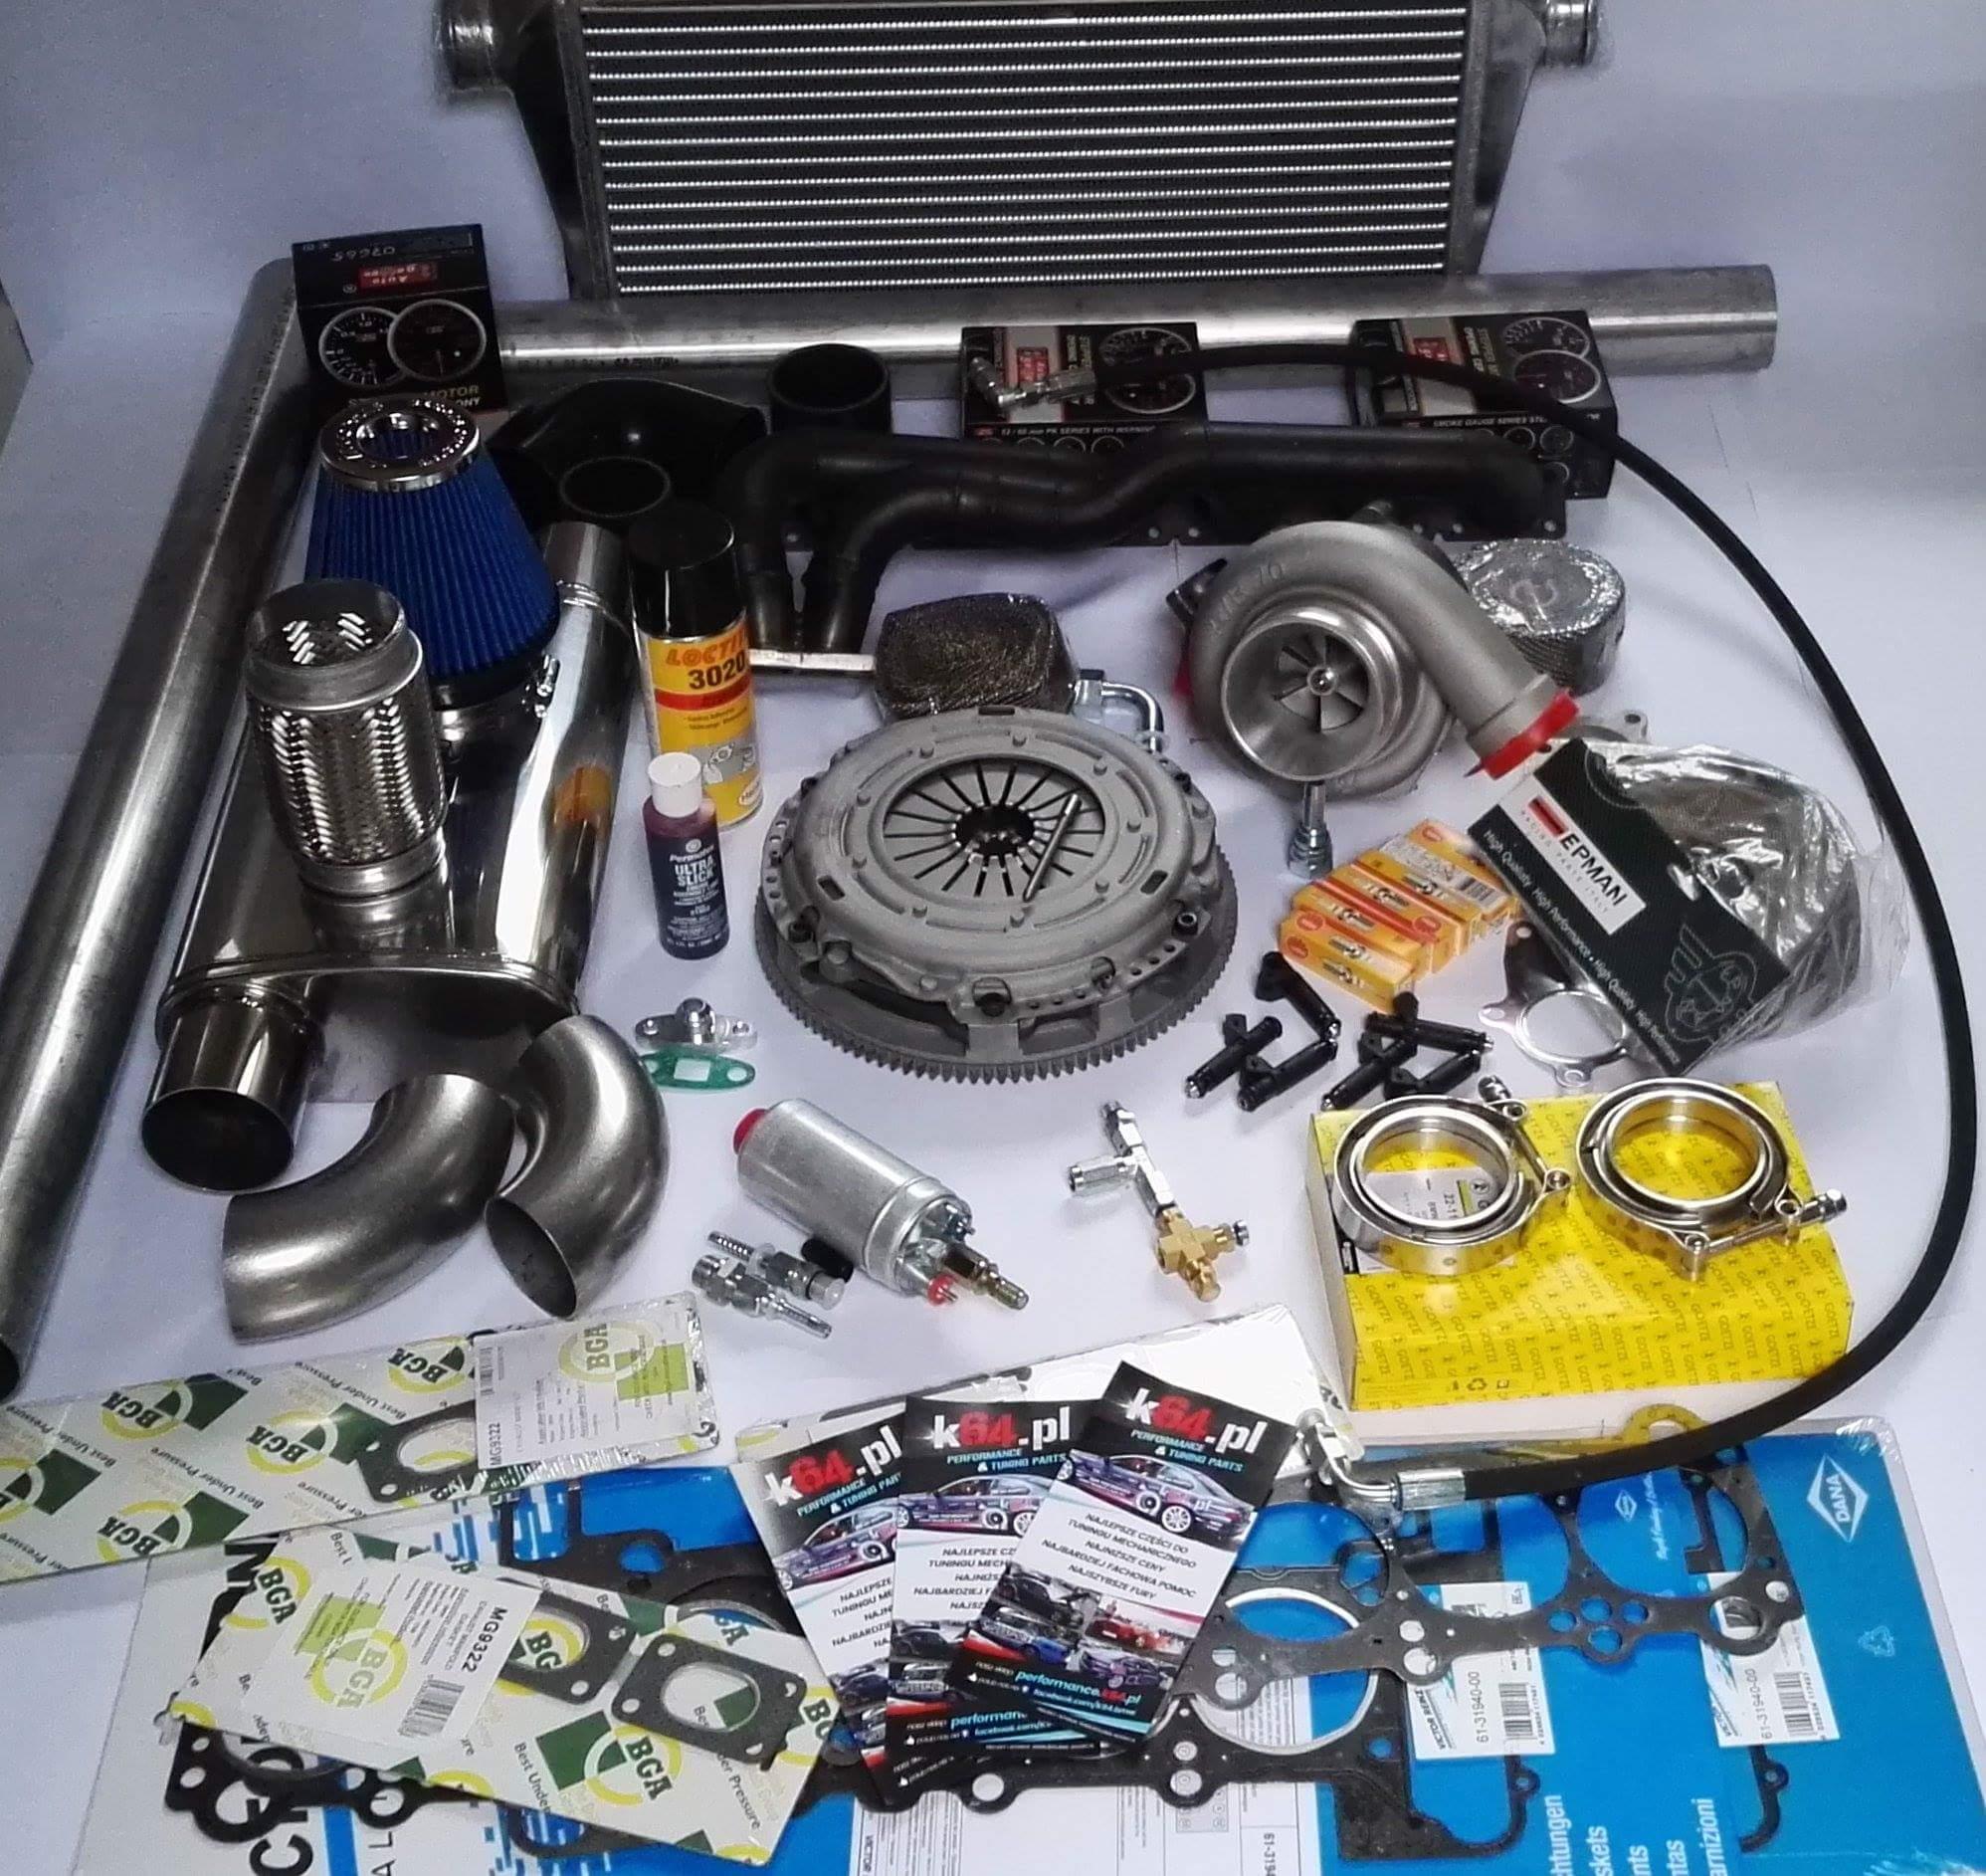 BMW TURBO ZESTAW M54 M52 E46 E39 K64 KIT !!! - 6992007316